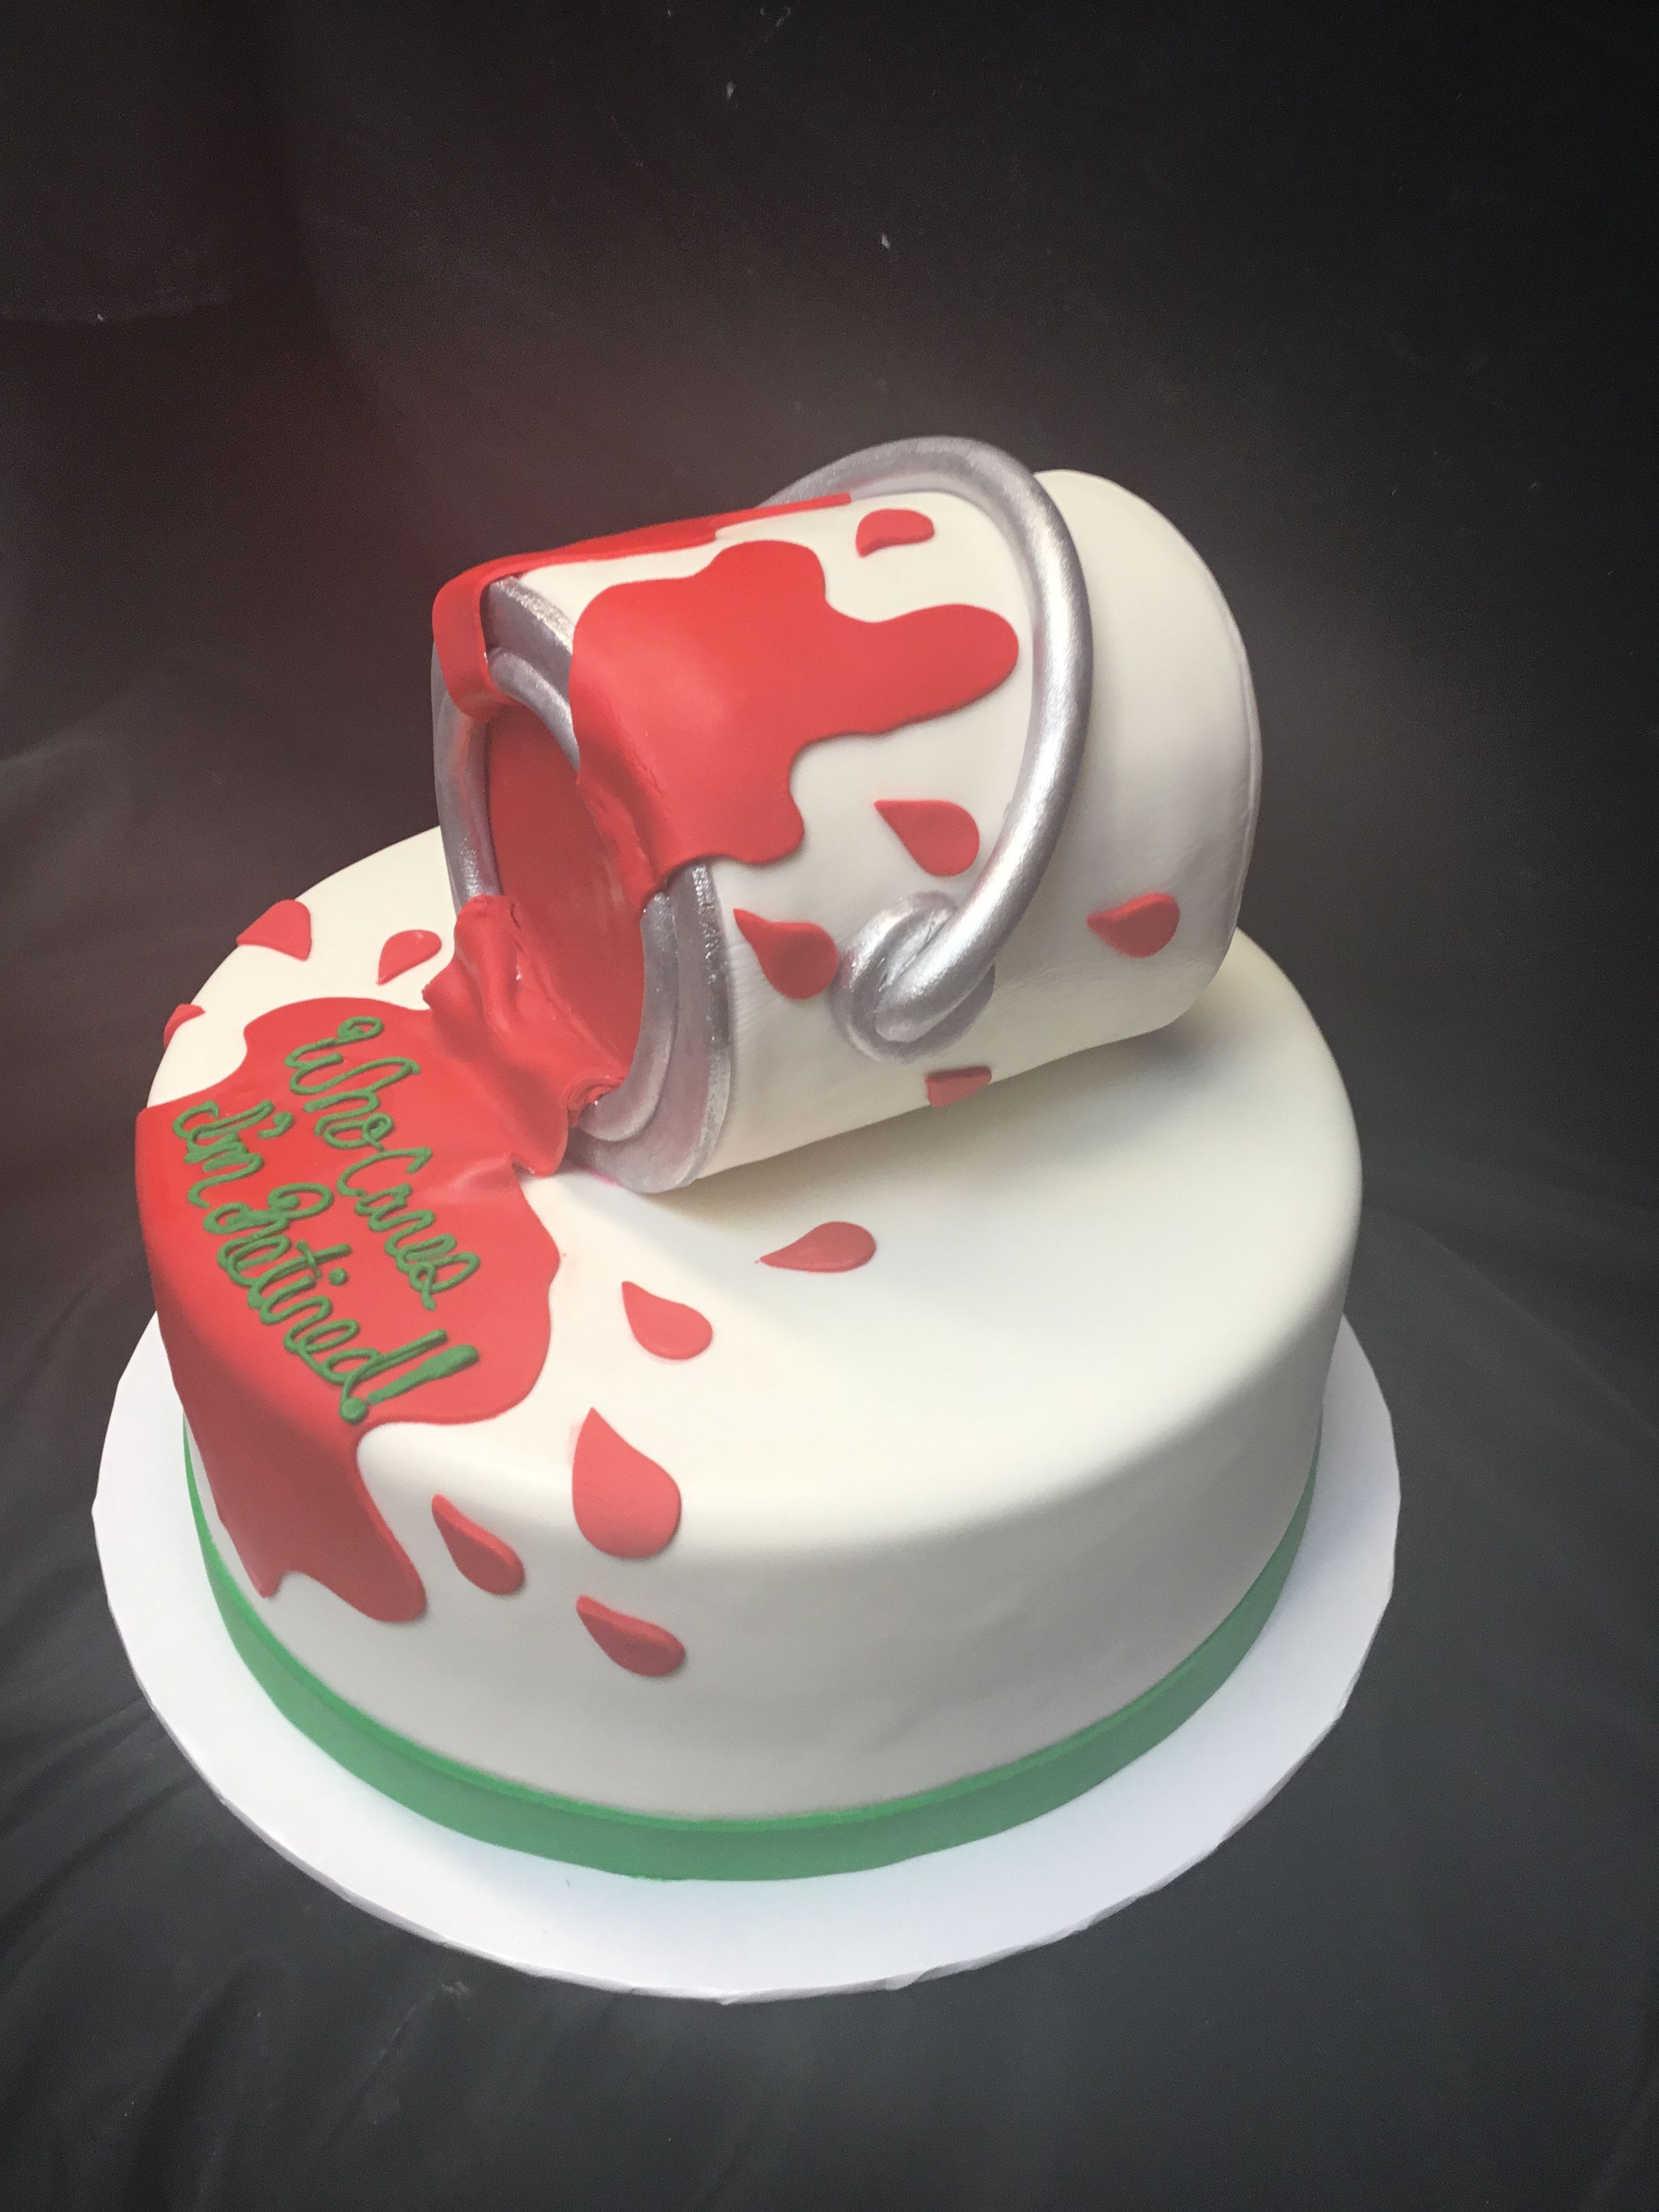 Pin By Jennicakes On Guys Birthday Cakes Pinterest Guy Birthday